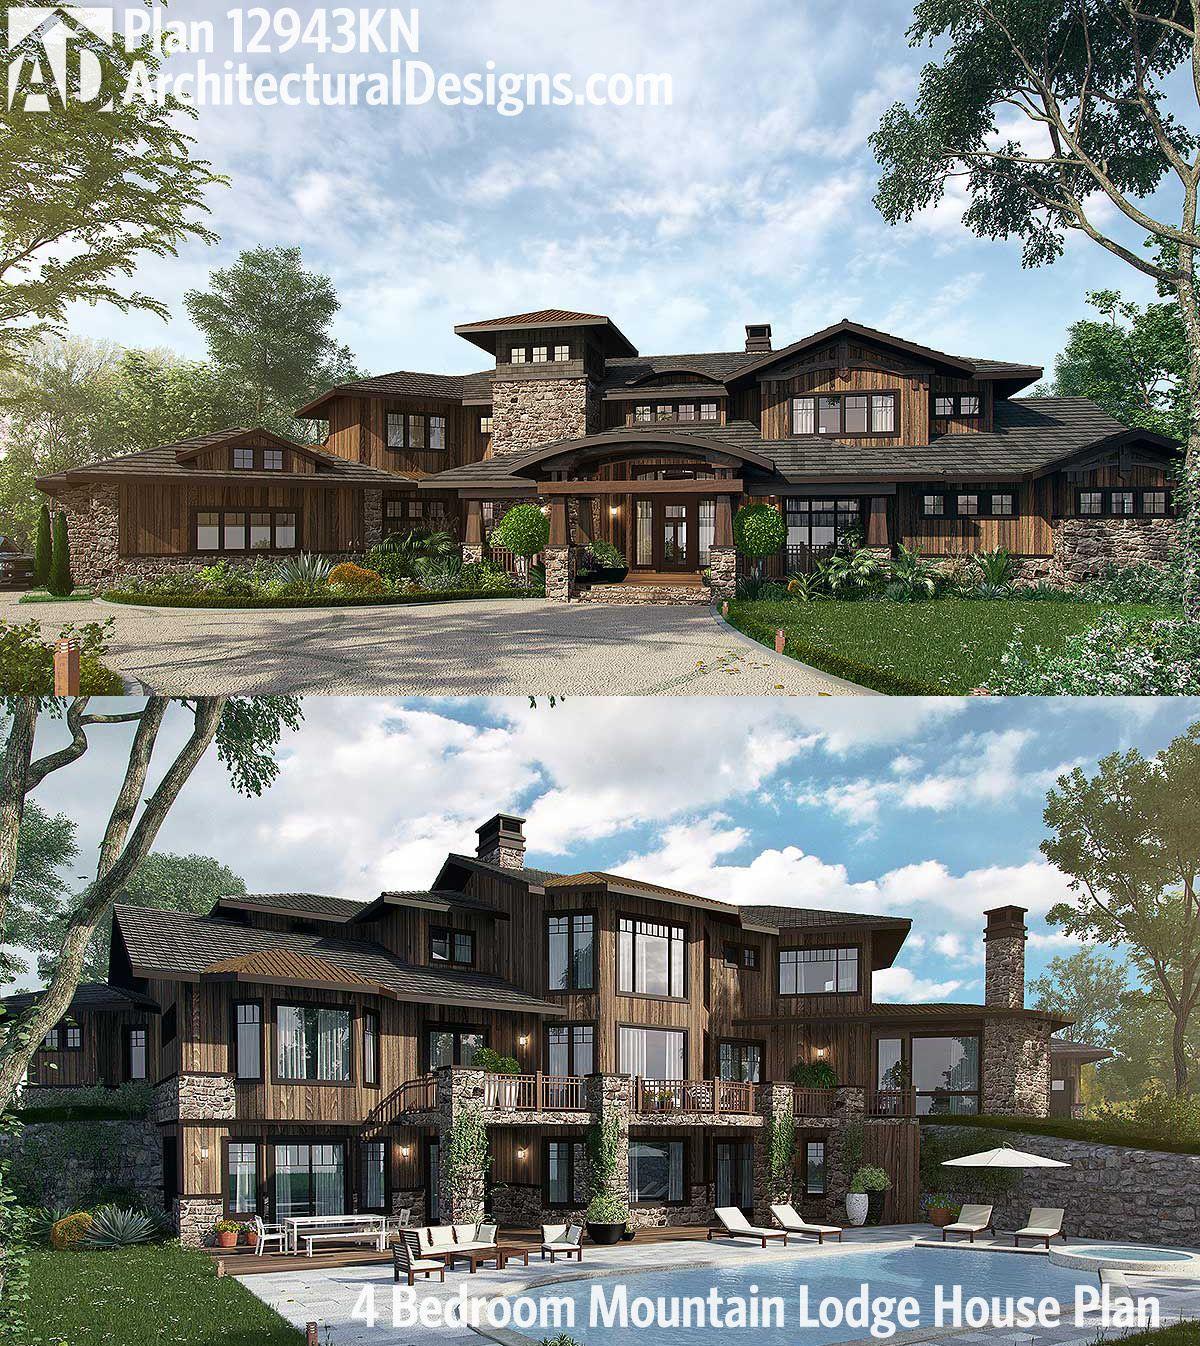 Plan 12943KN: 4 Bedroom Mountain Lodge House Plan